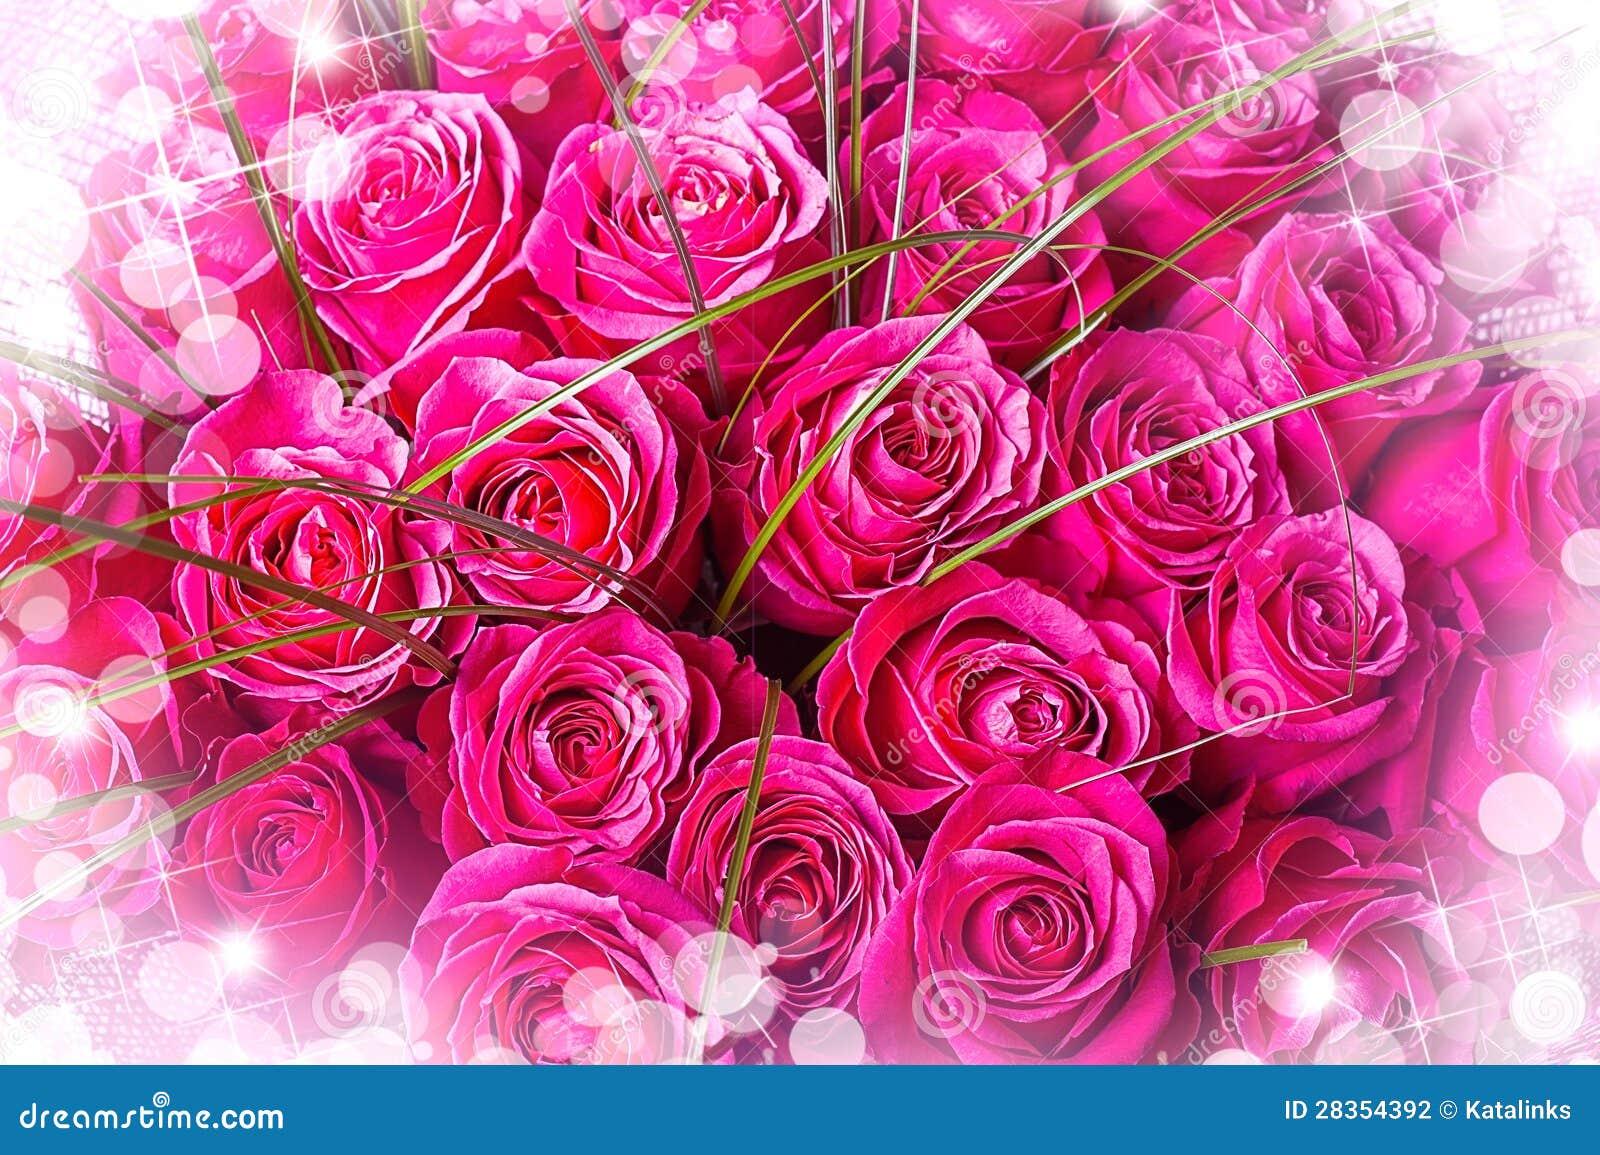 sch ner gro er blumenstrau der rosa rosen. Black Bedroom Furniture Sets. Home Design Ideas